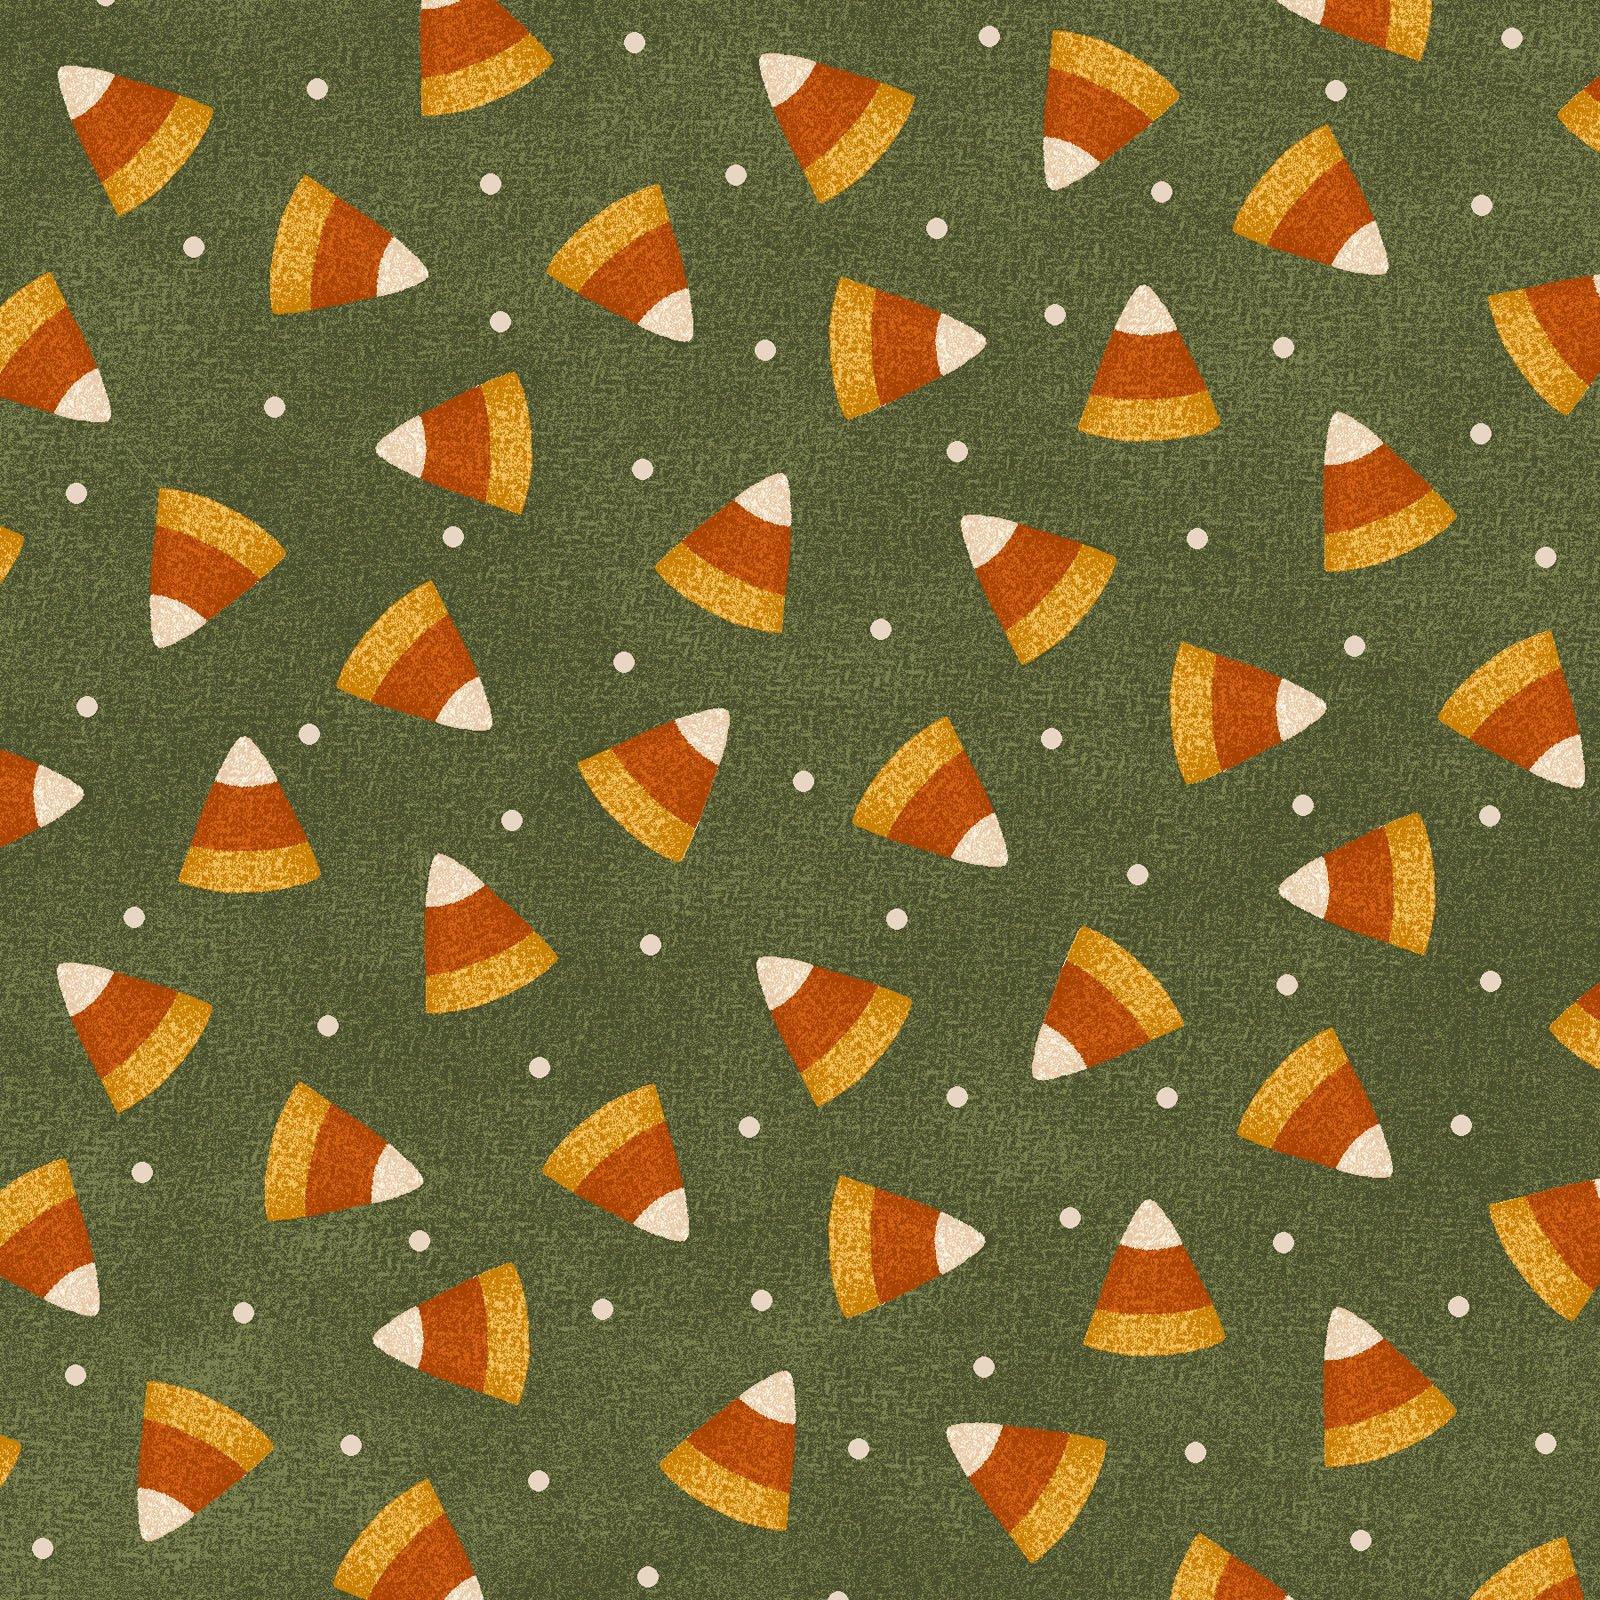 Happy Jack's & Friends Flannel  MAS9402-G